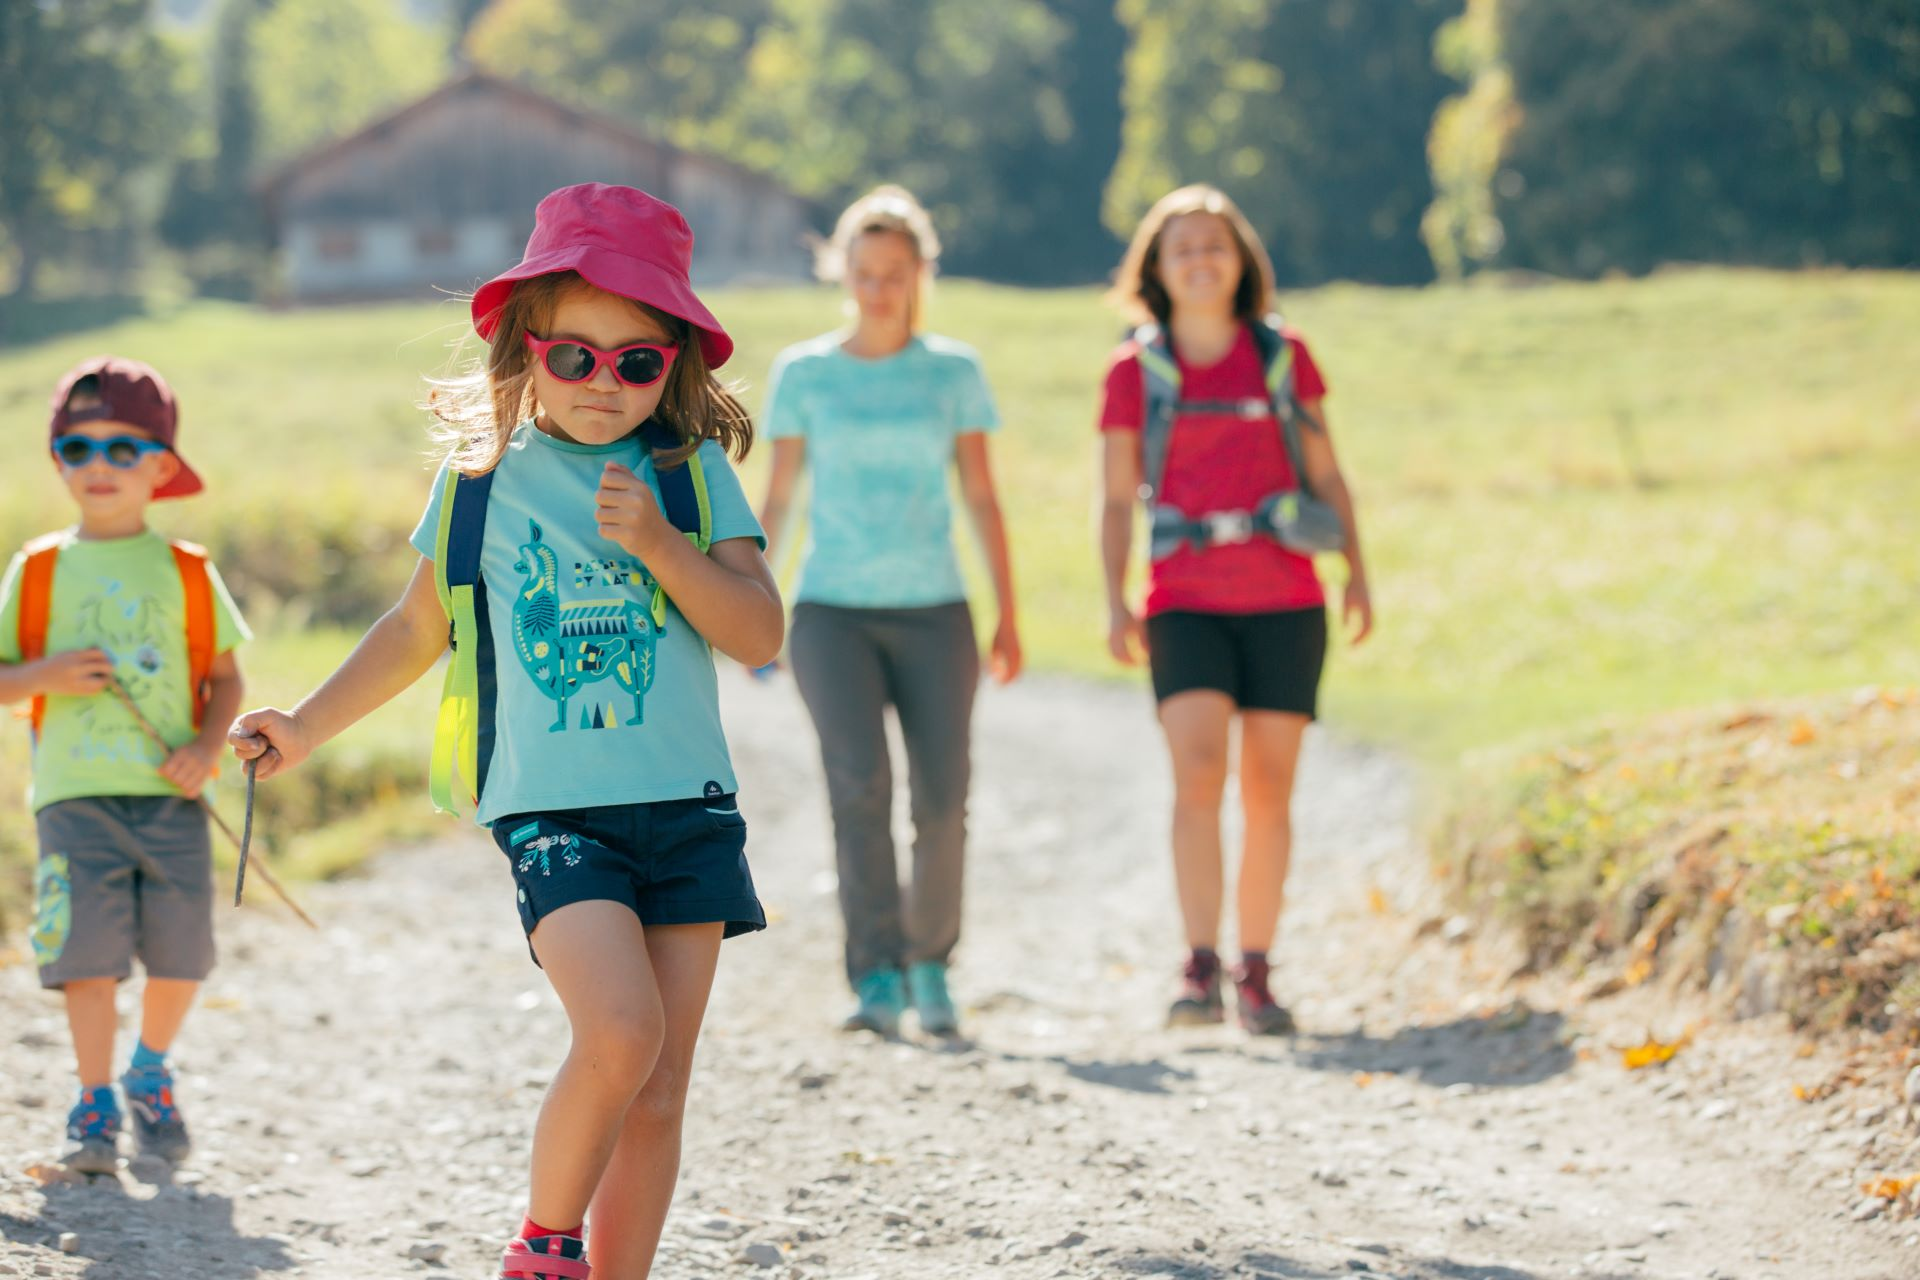 Family Friendly Walking Routes